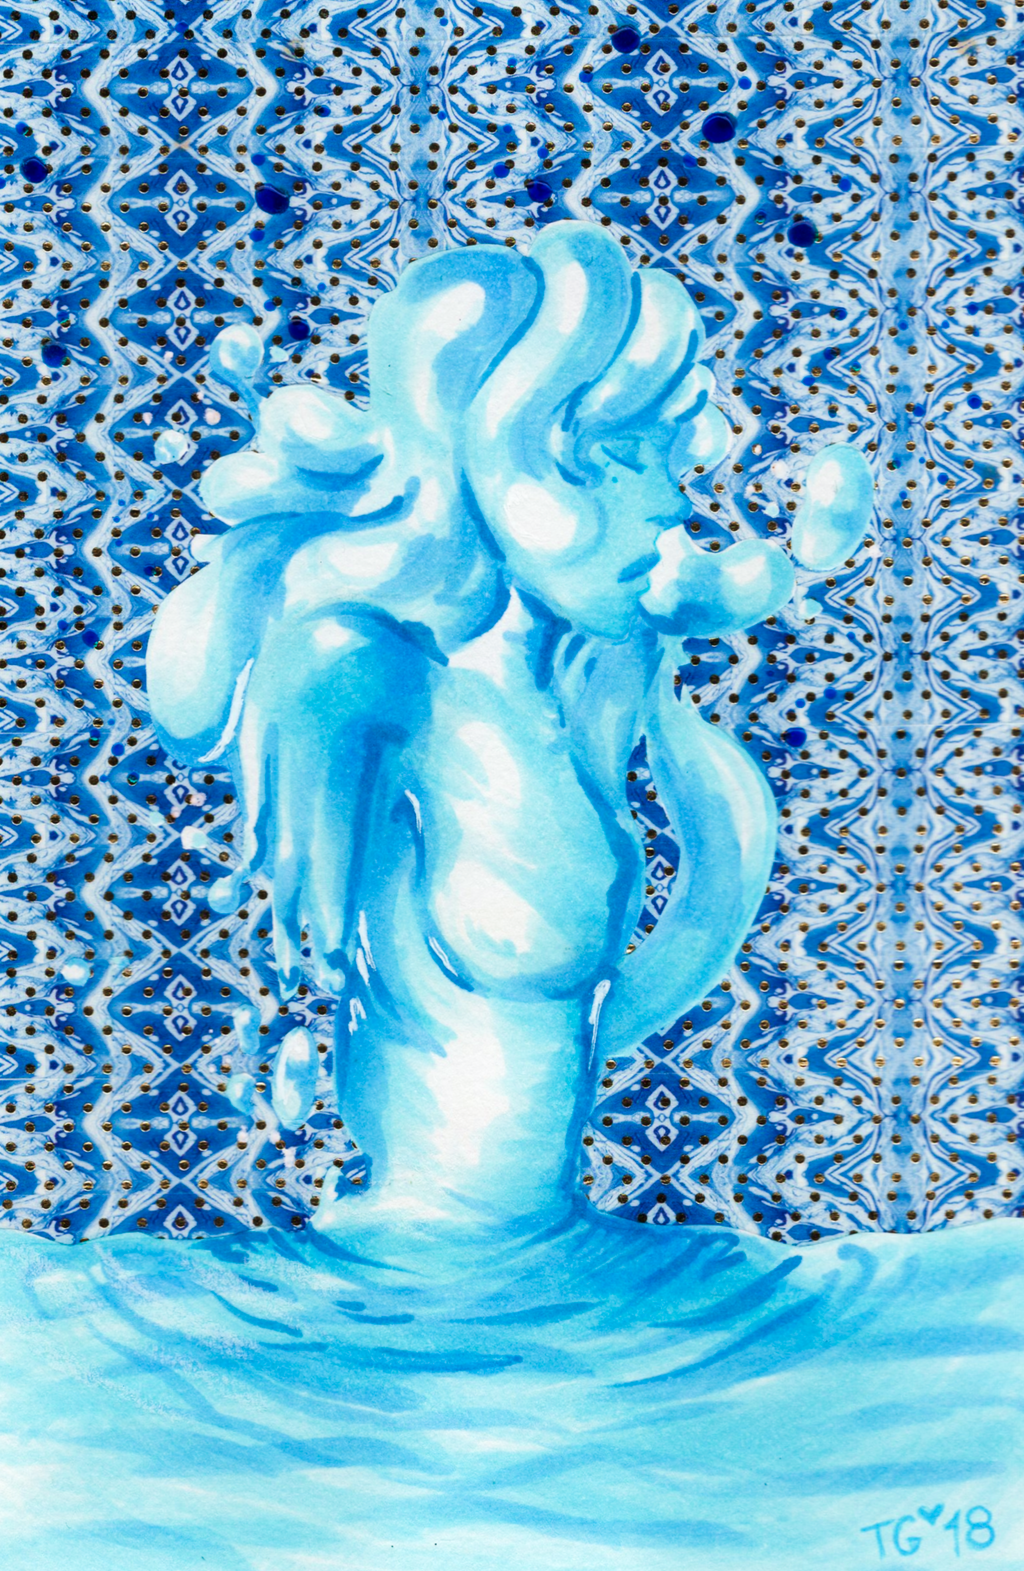 Inktober #2: Tranquil by stylecheetah